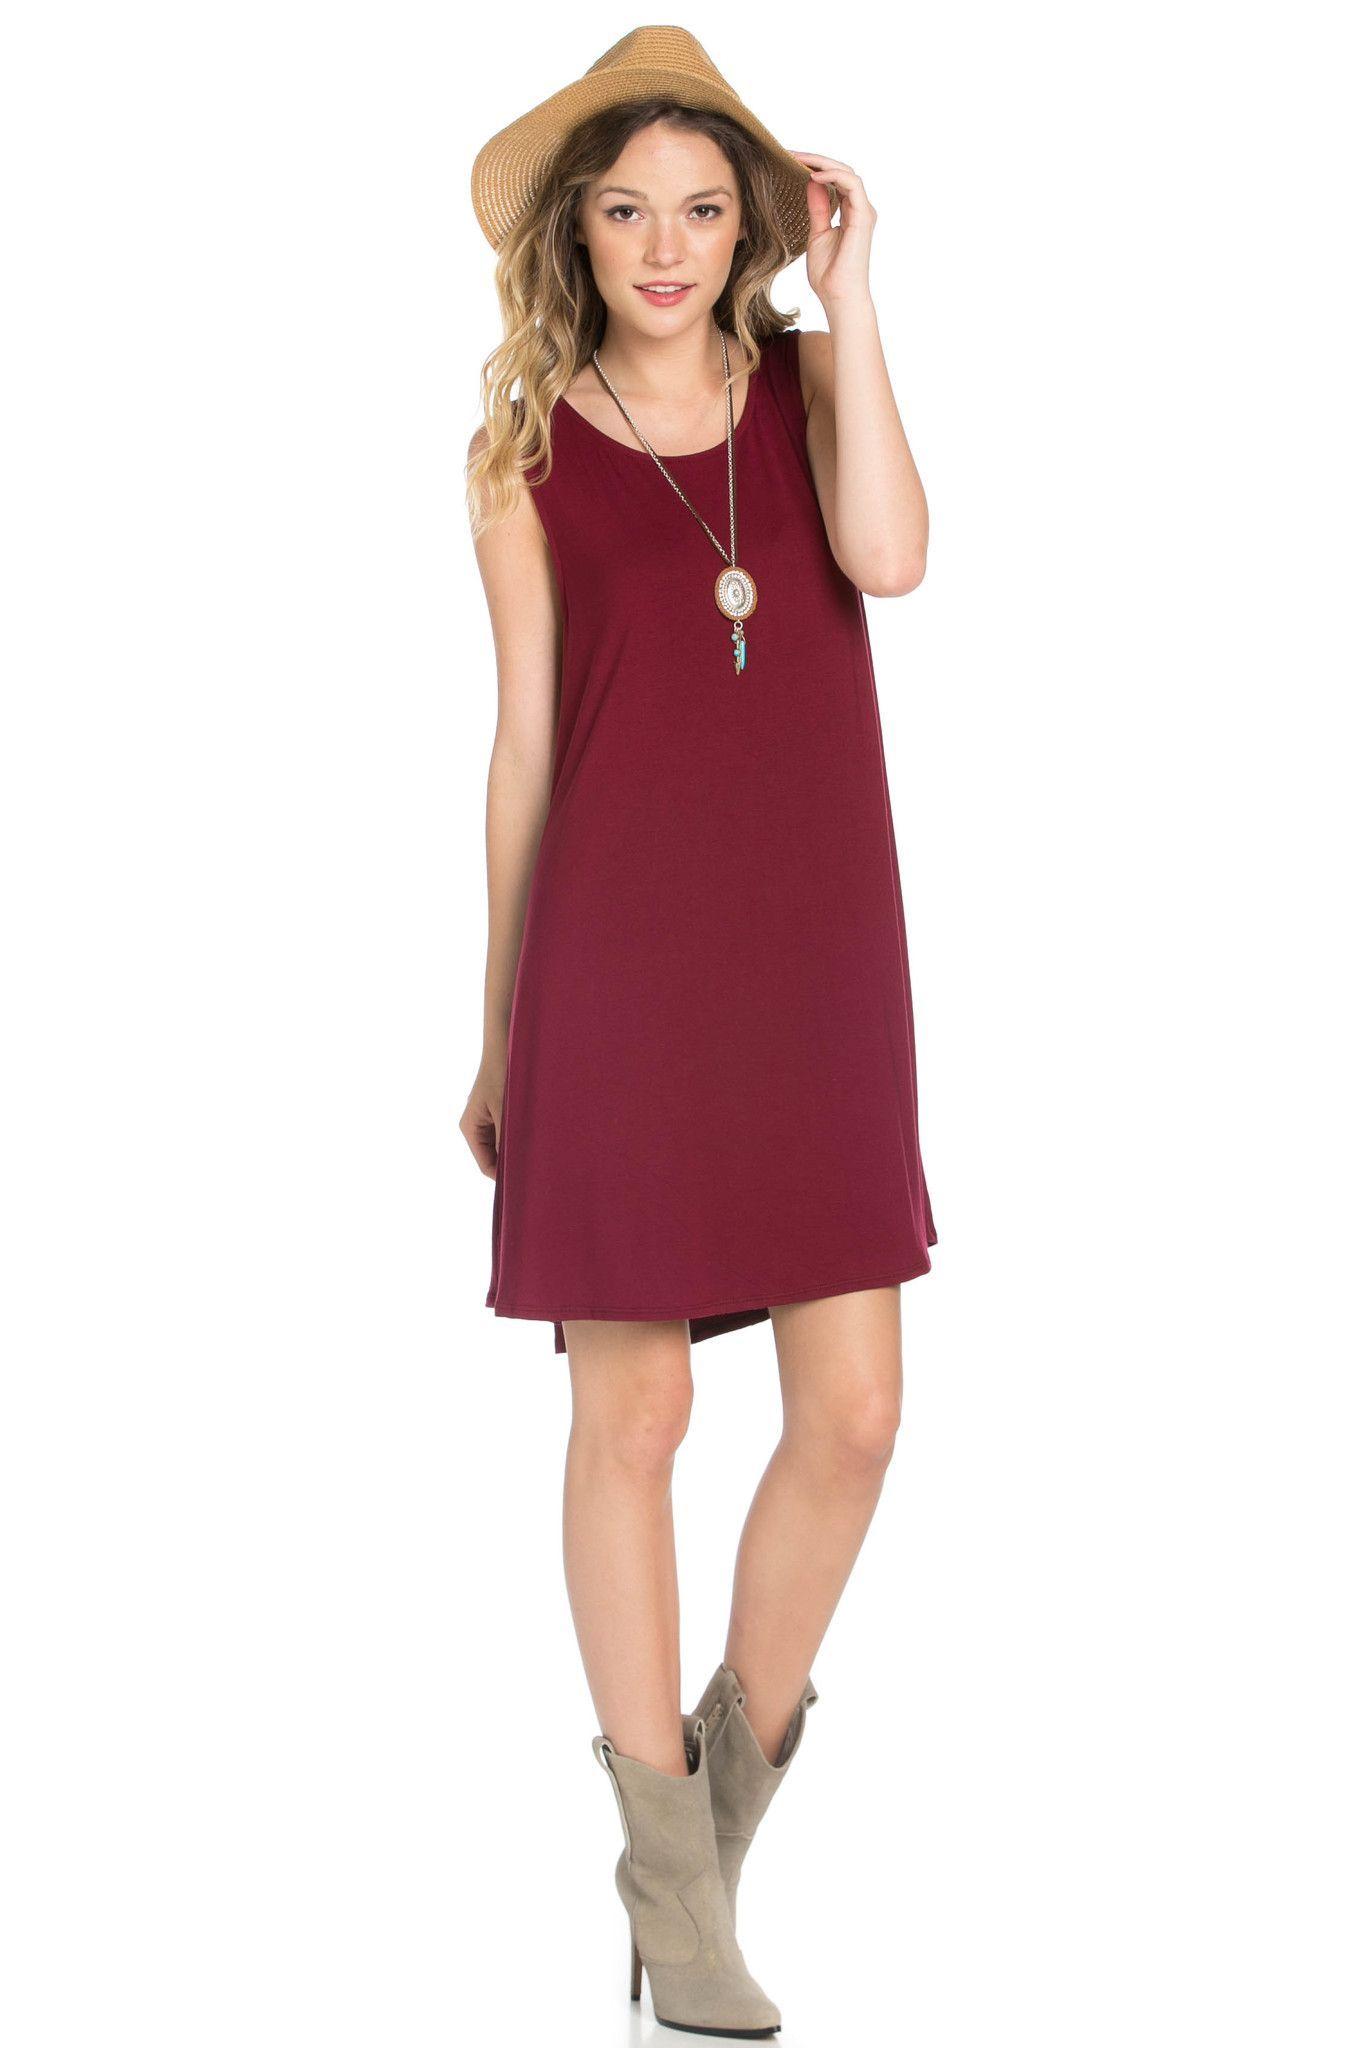 c5edfa899610 The Burgundy Swing Dress Sleeveless Swing Dress